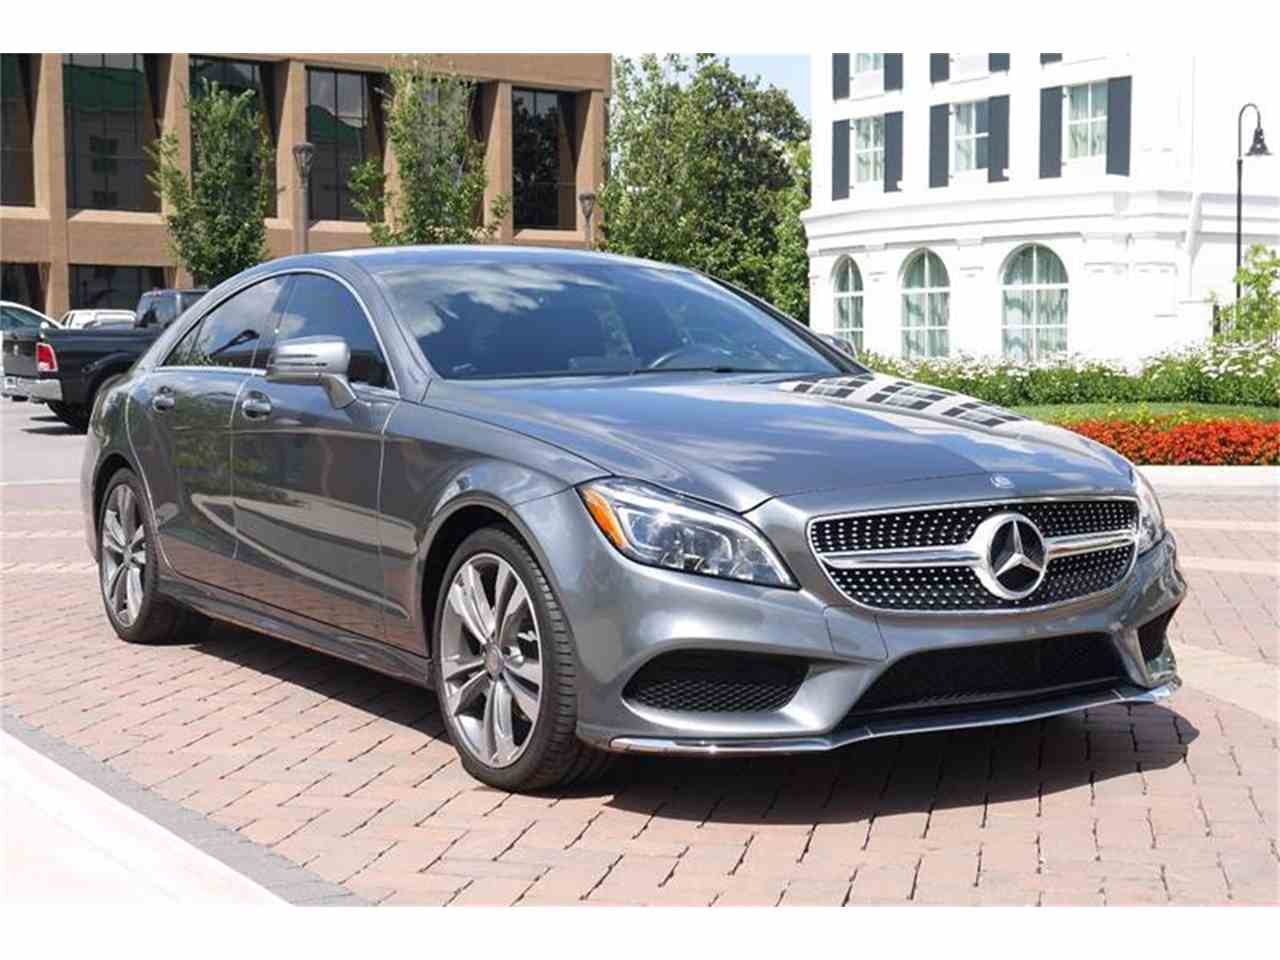 2016 Mercedes-Benz CLS-Class for Sale - CC-999014